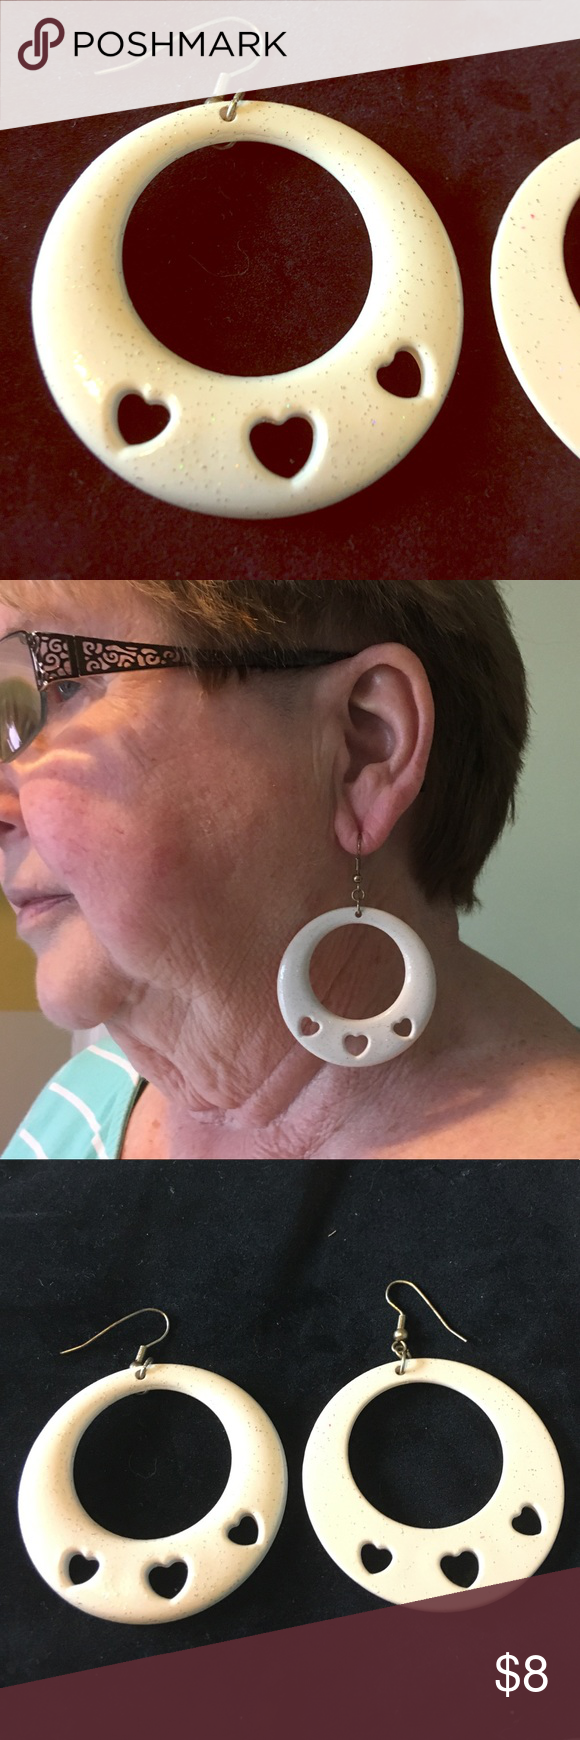 90s nose piercing  Large White Plastic s Hoop Earrings  My Posh Closet  Pinterest